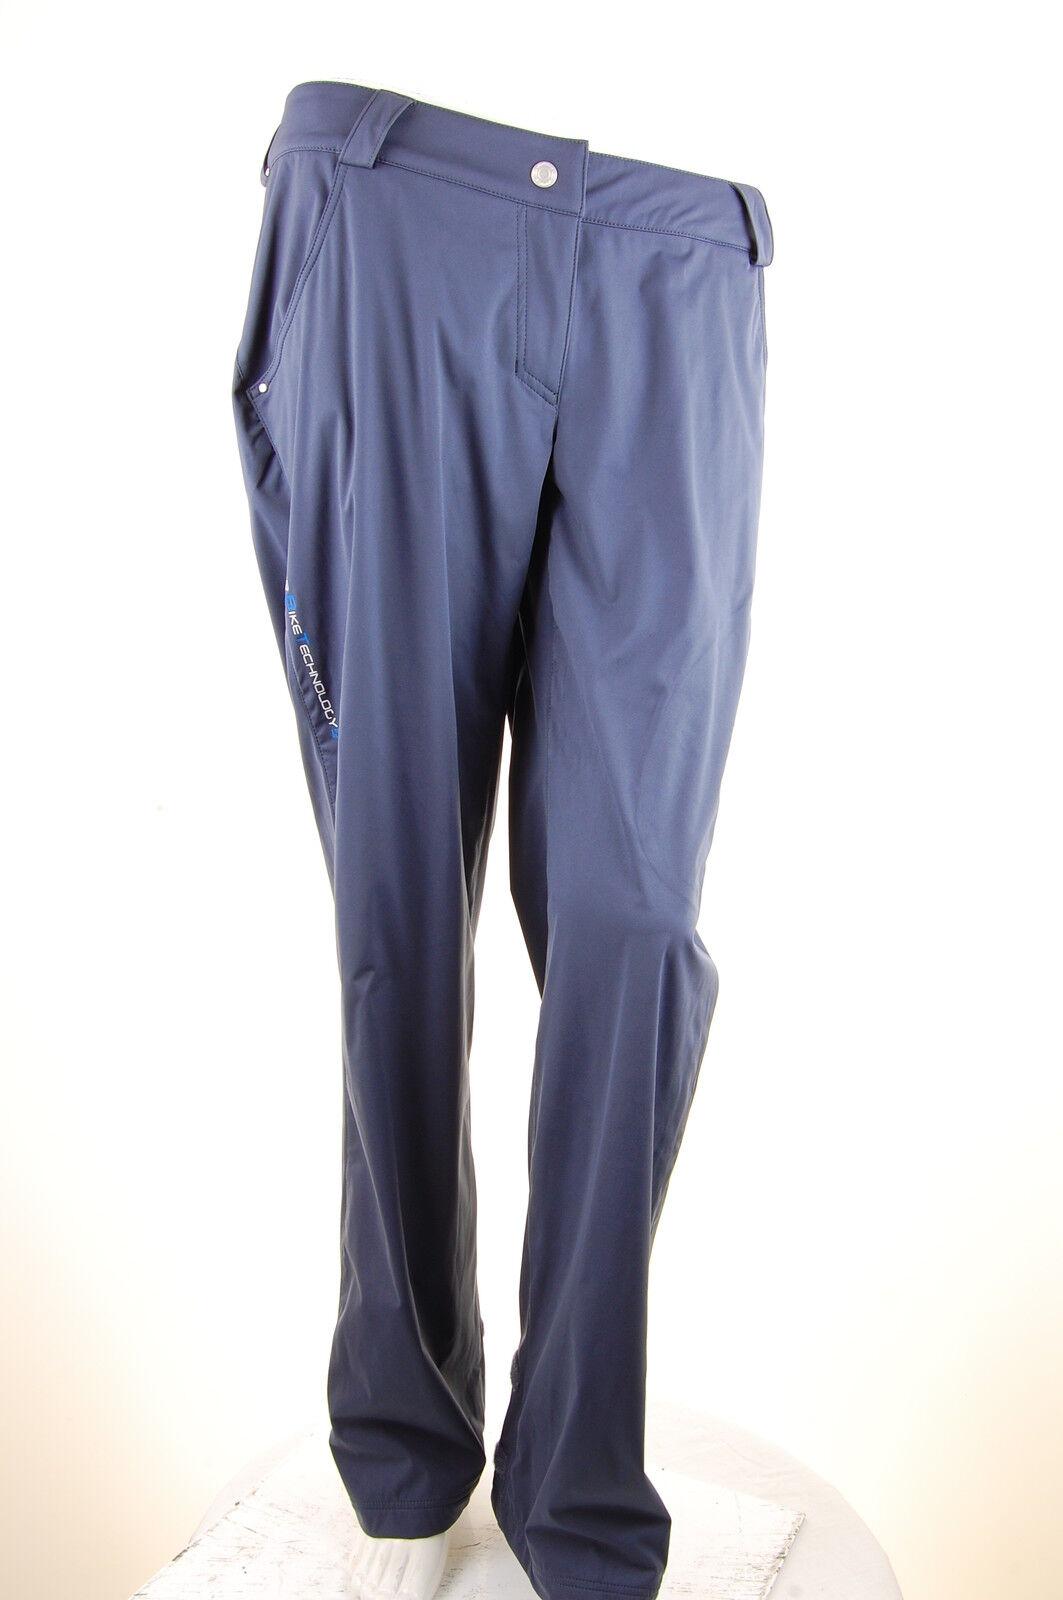 Ziener Women's Function Bike Jeans Denim Pants Soft Shell Cath 123 Grey Size